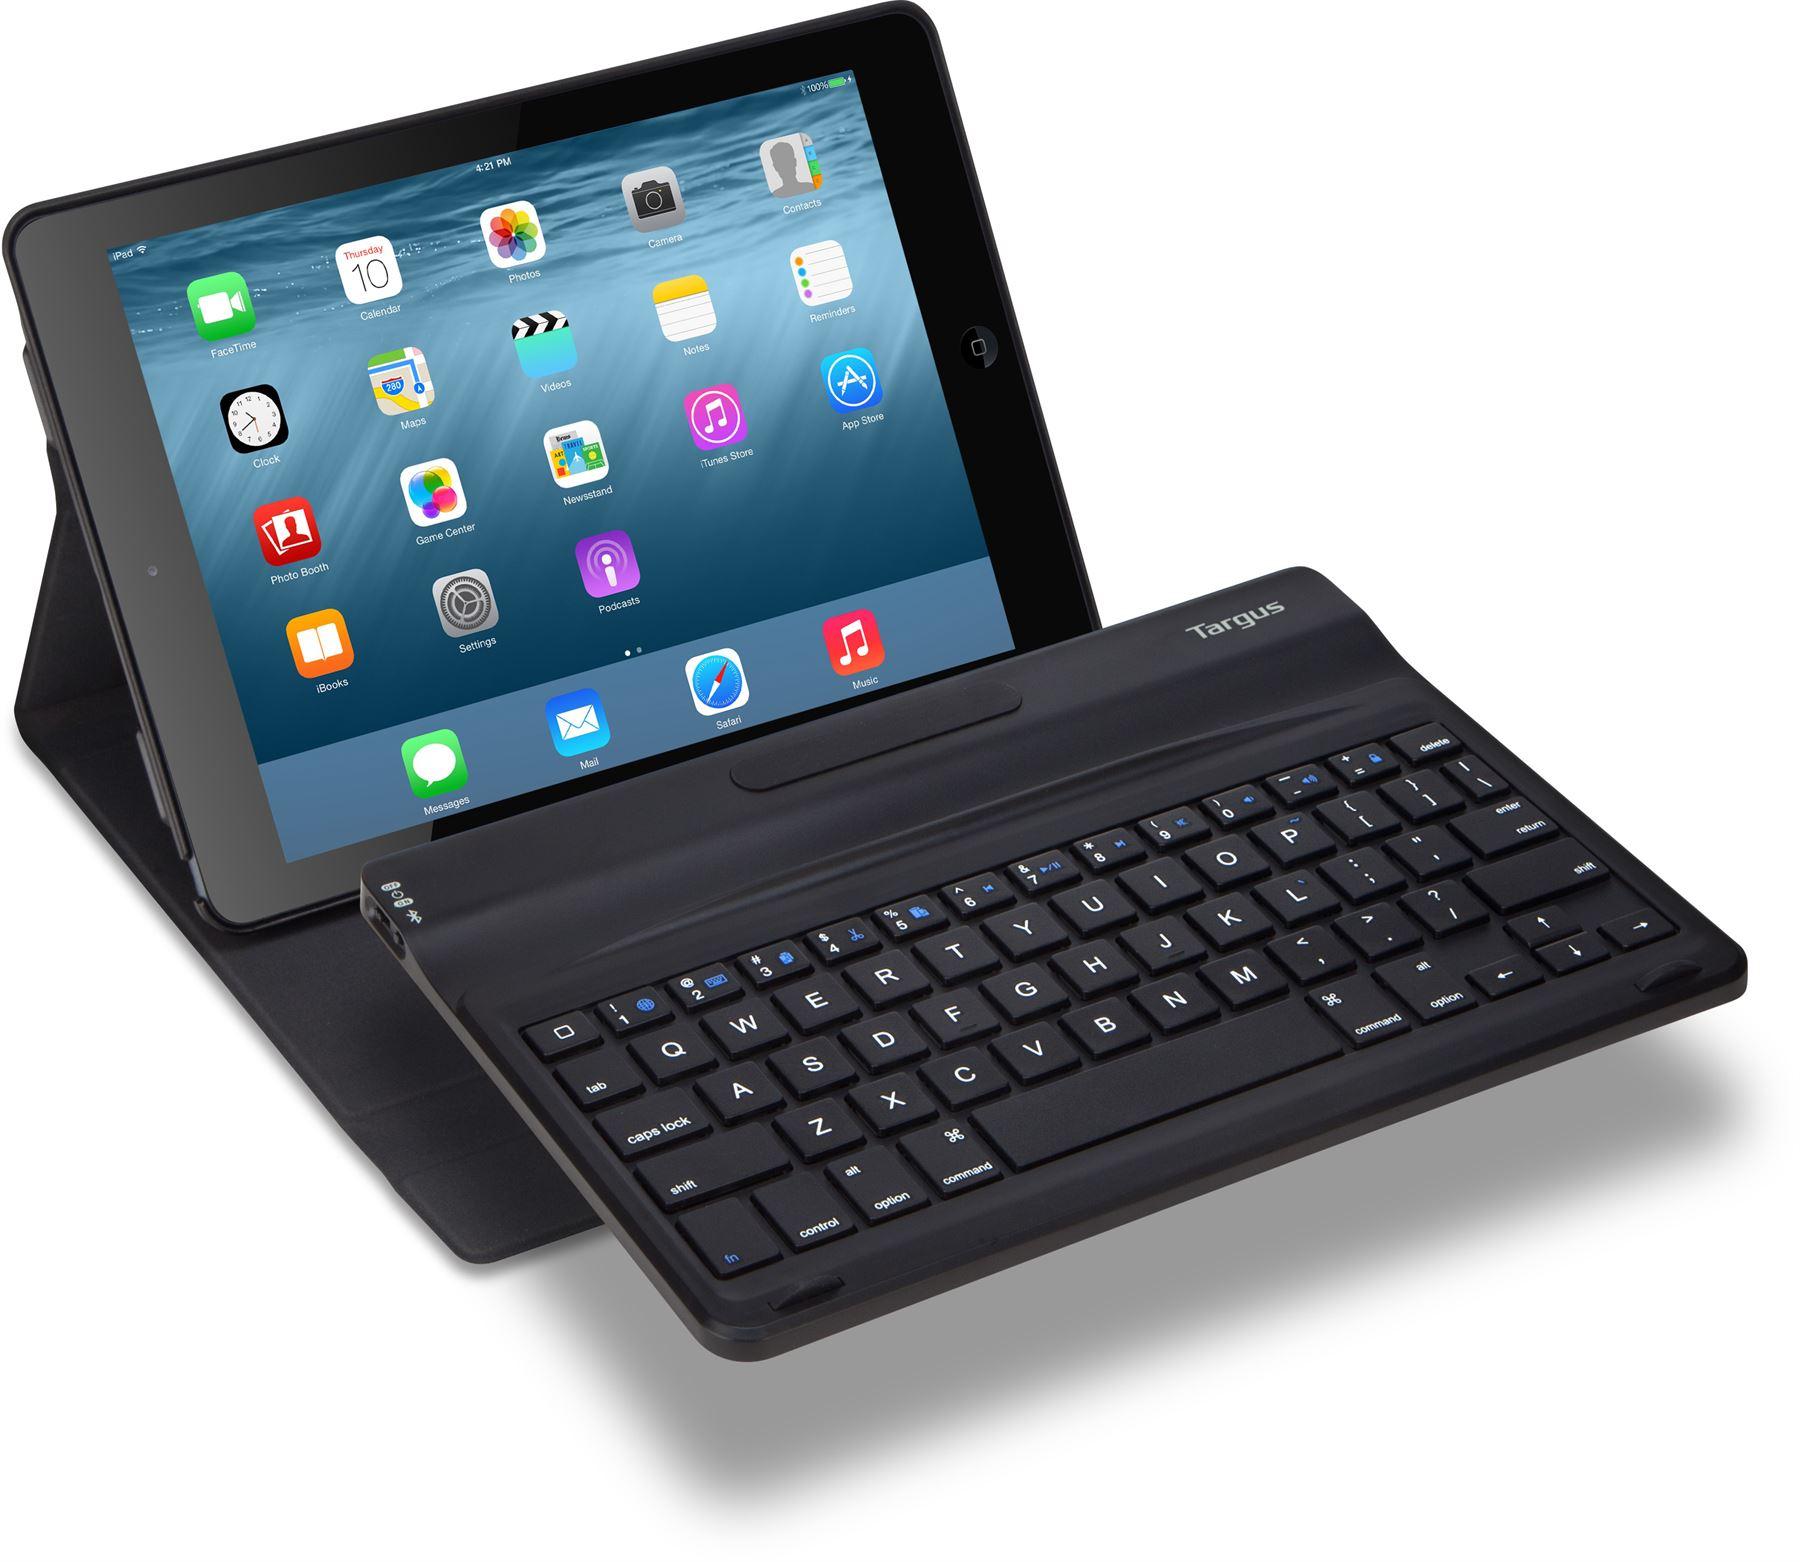 versavu 360 folio keyboard case for ipad air 2 thz540us. Black Bedroom Furniture Sets. Home Design Ideas